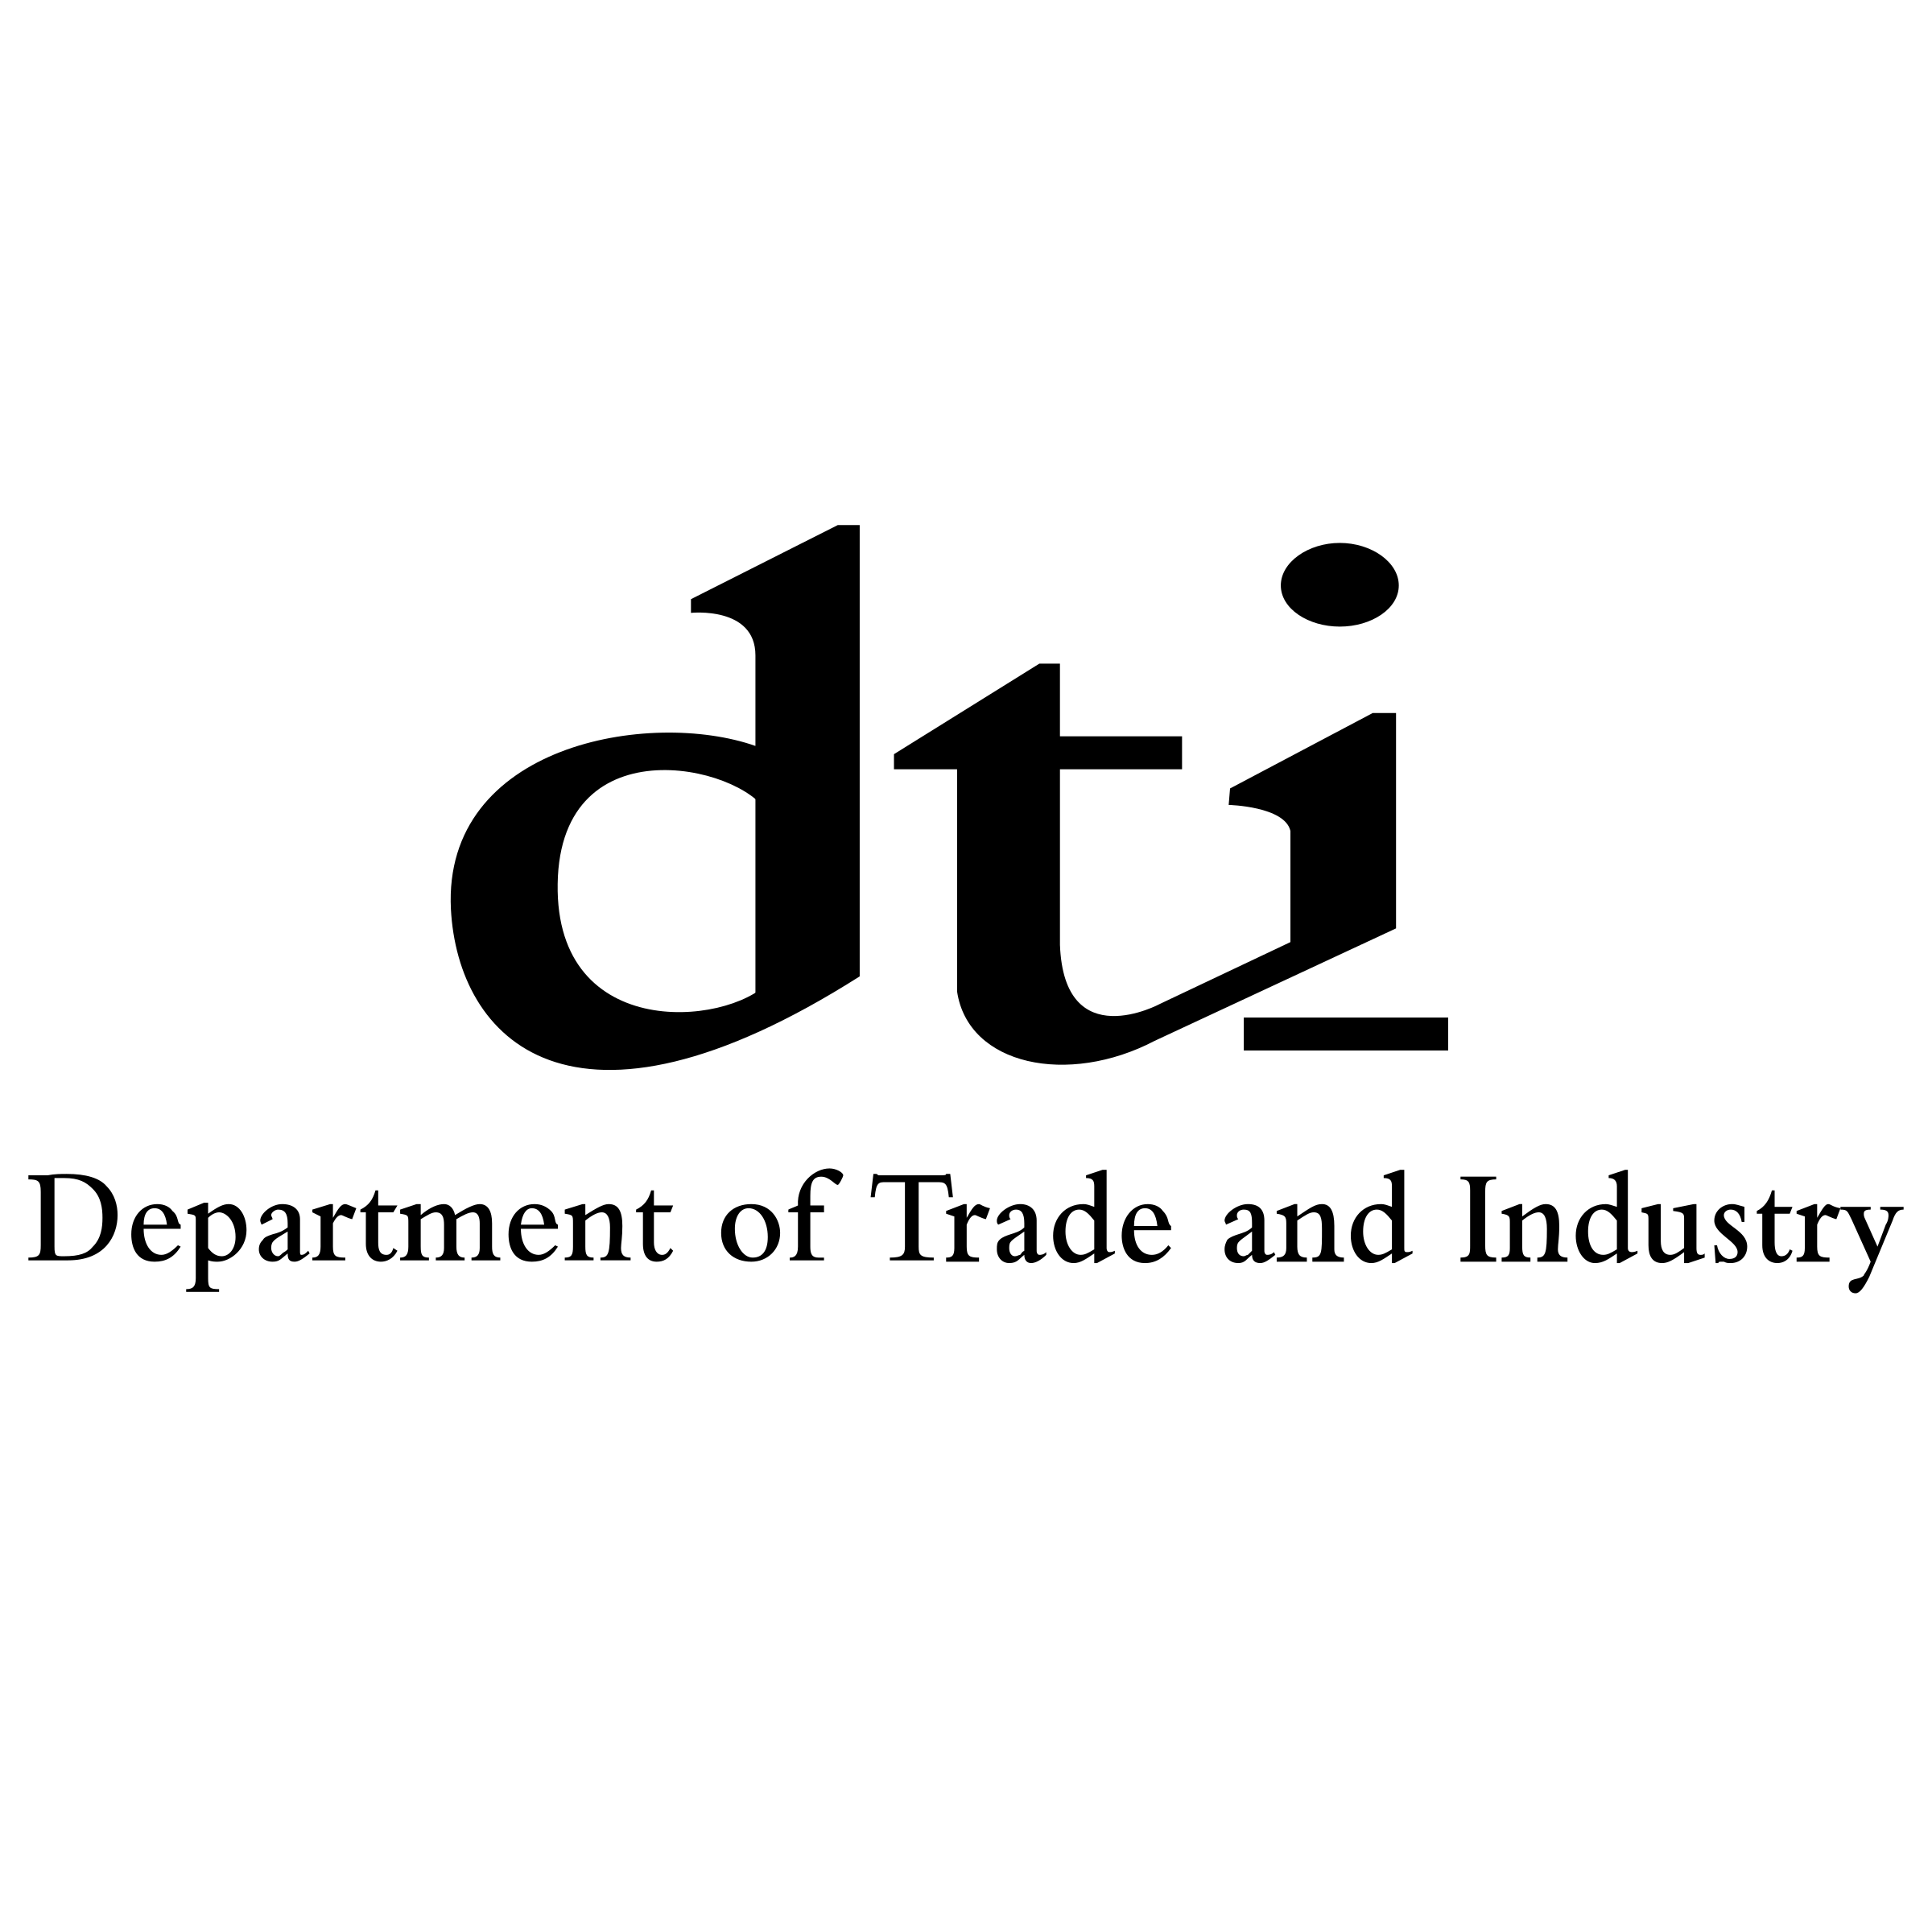 DTI Logo PNG Transparent & SVG Vector.